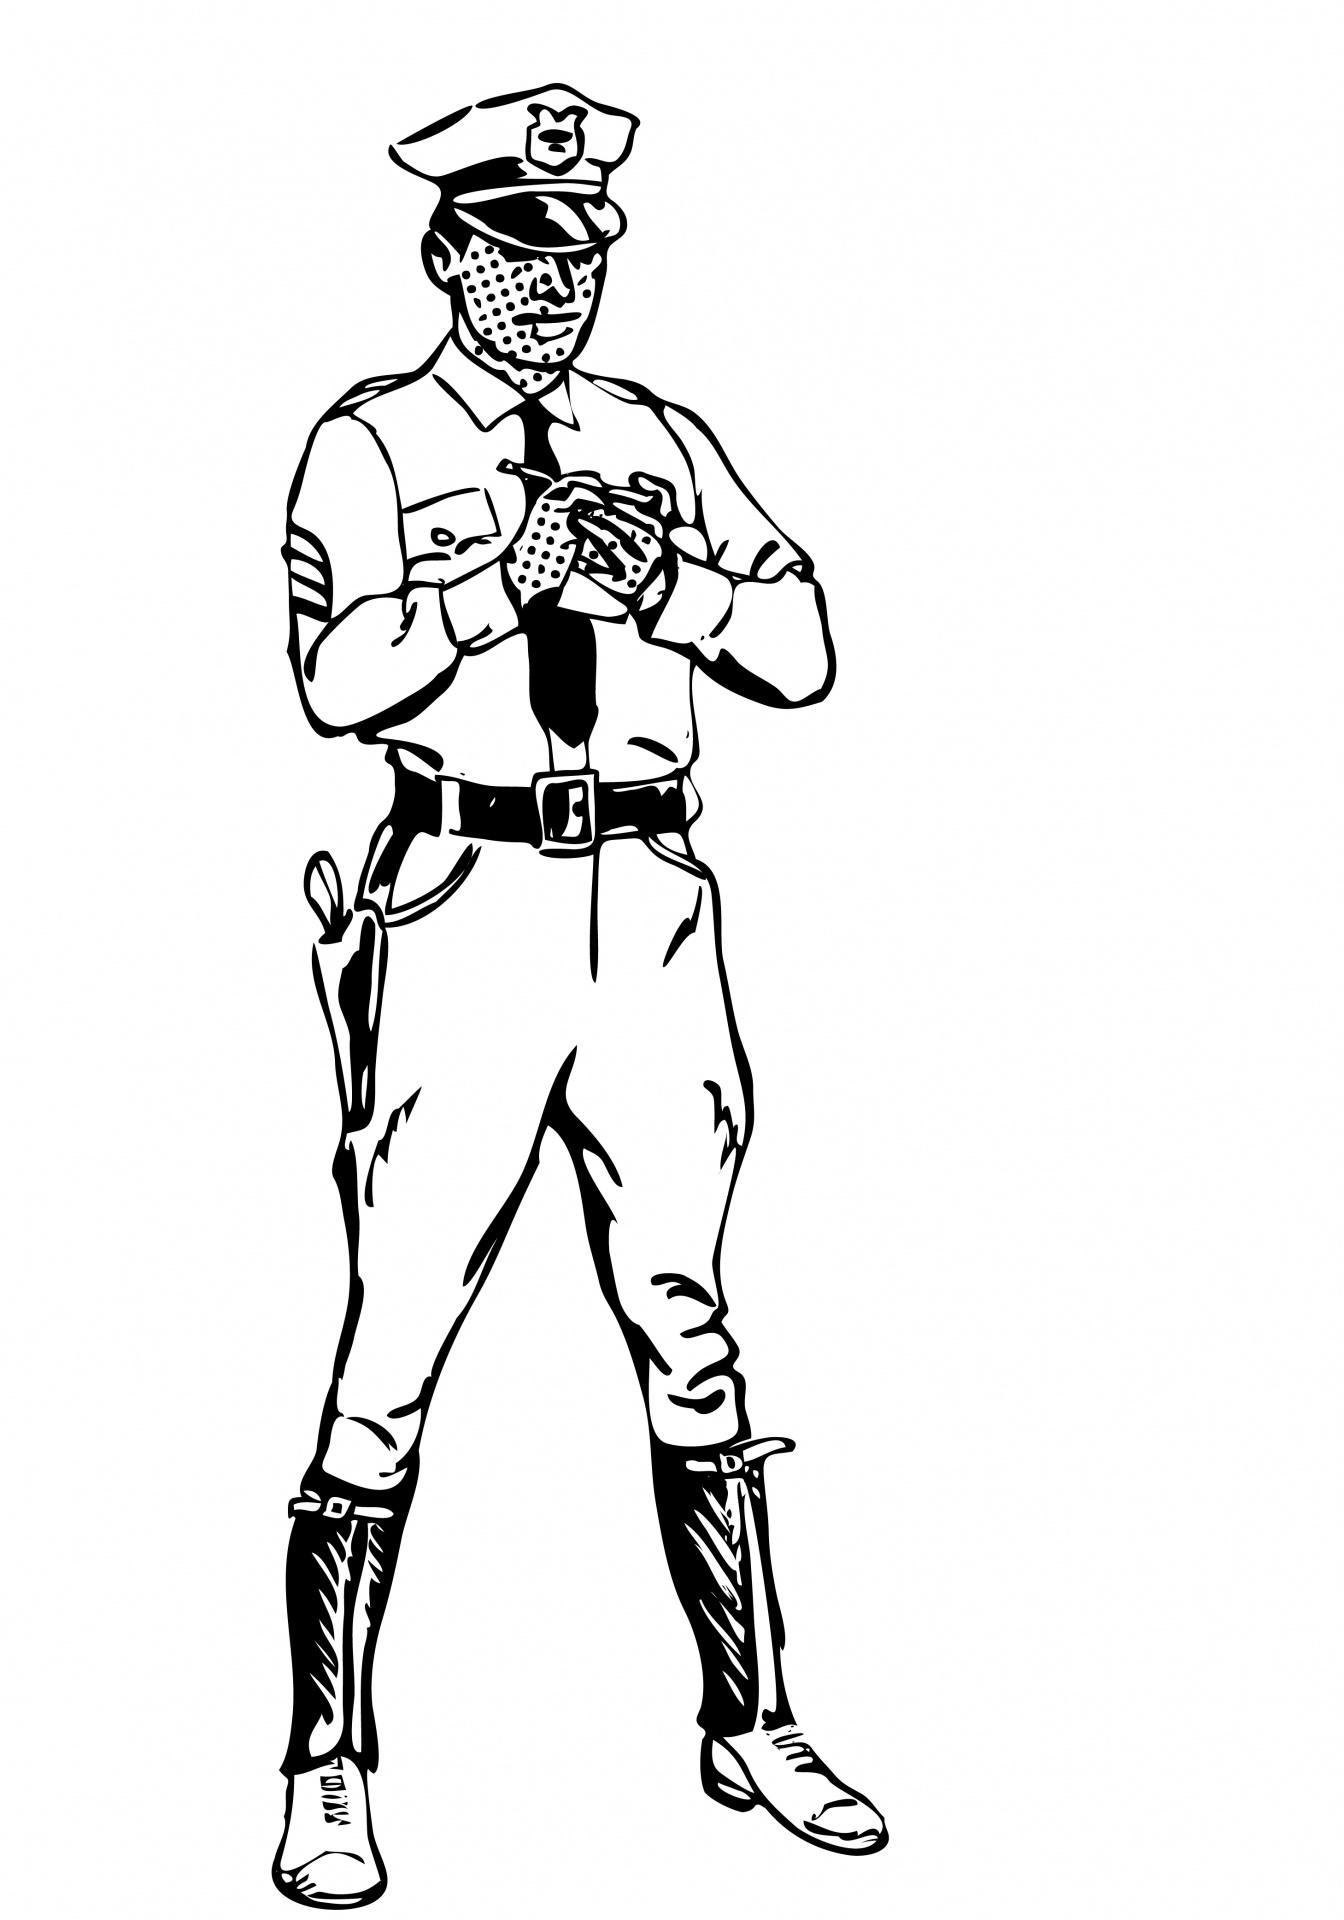 Monochrome clipart policeman Clipart Stock Clipart Police Police